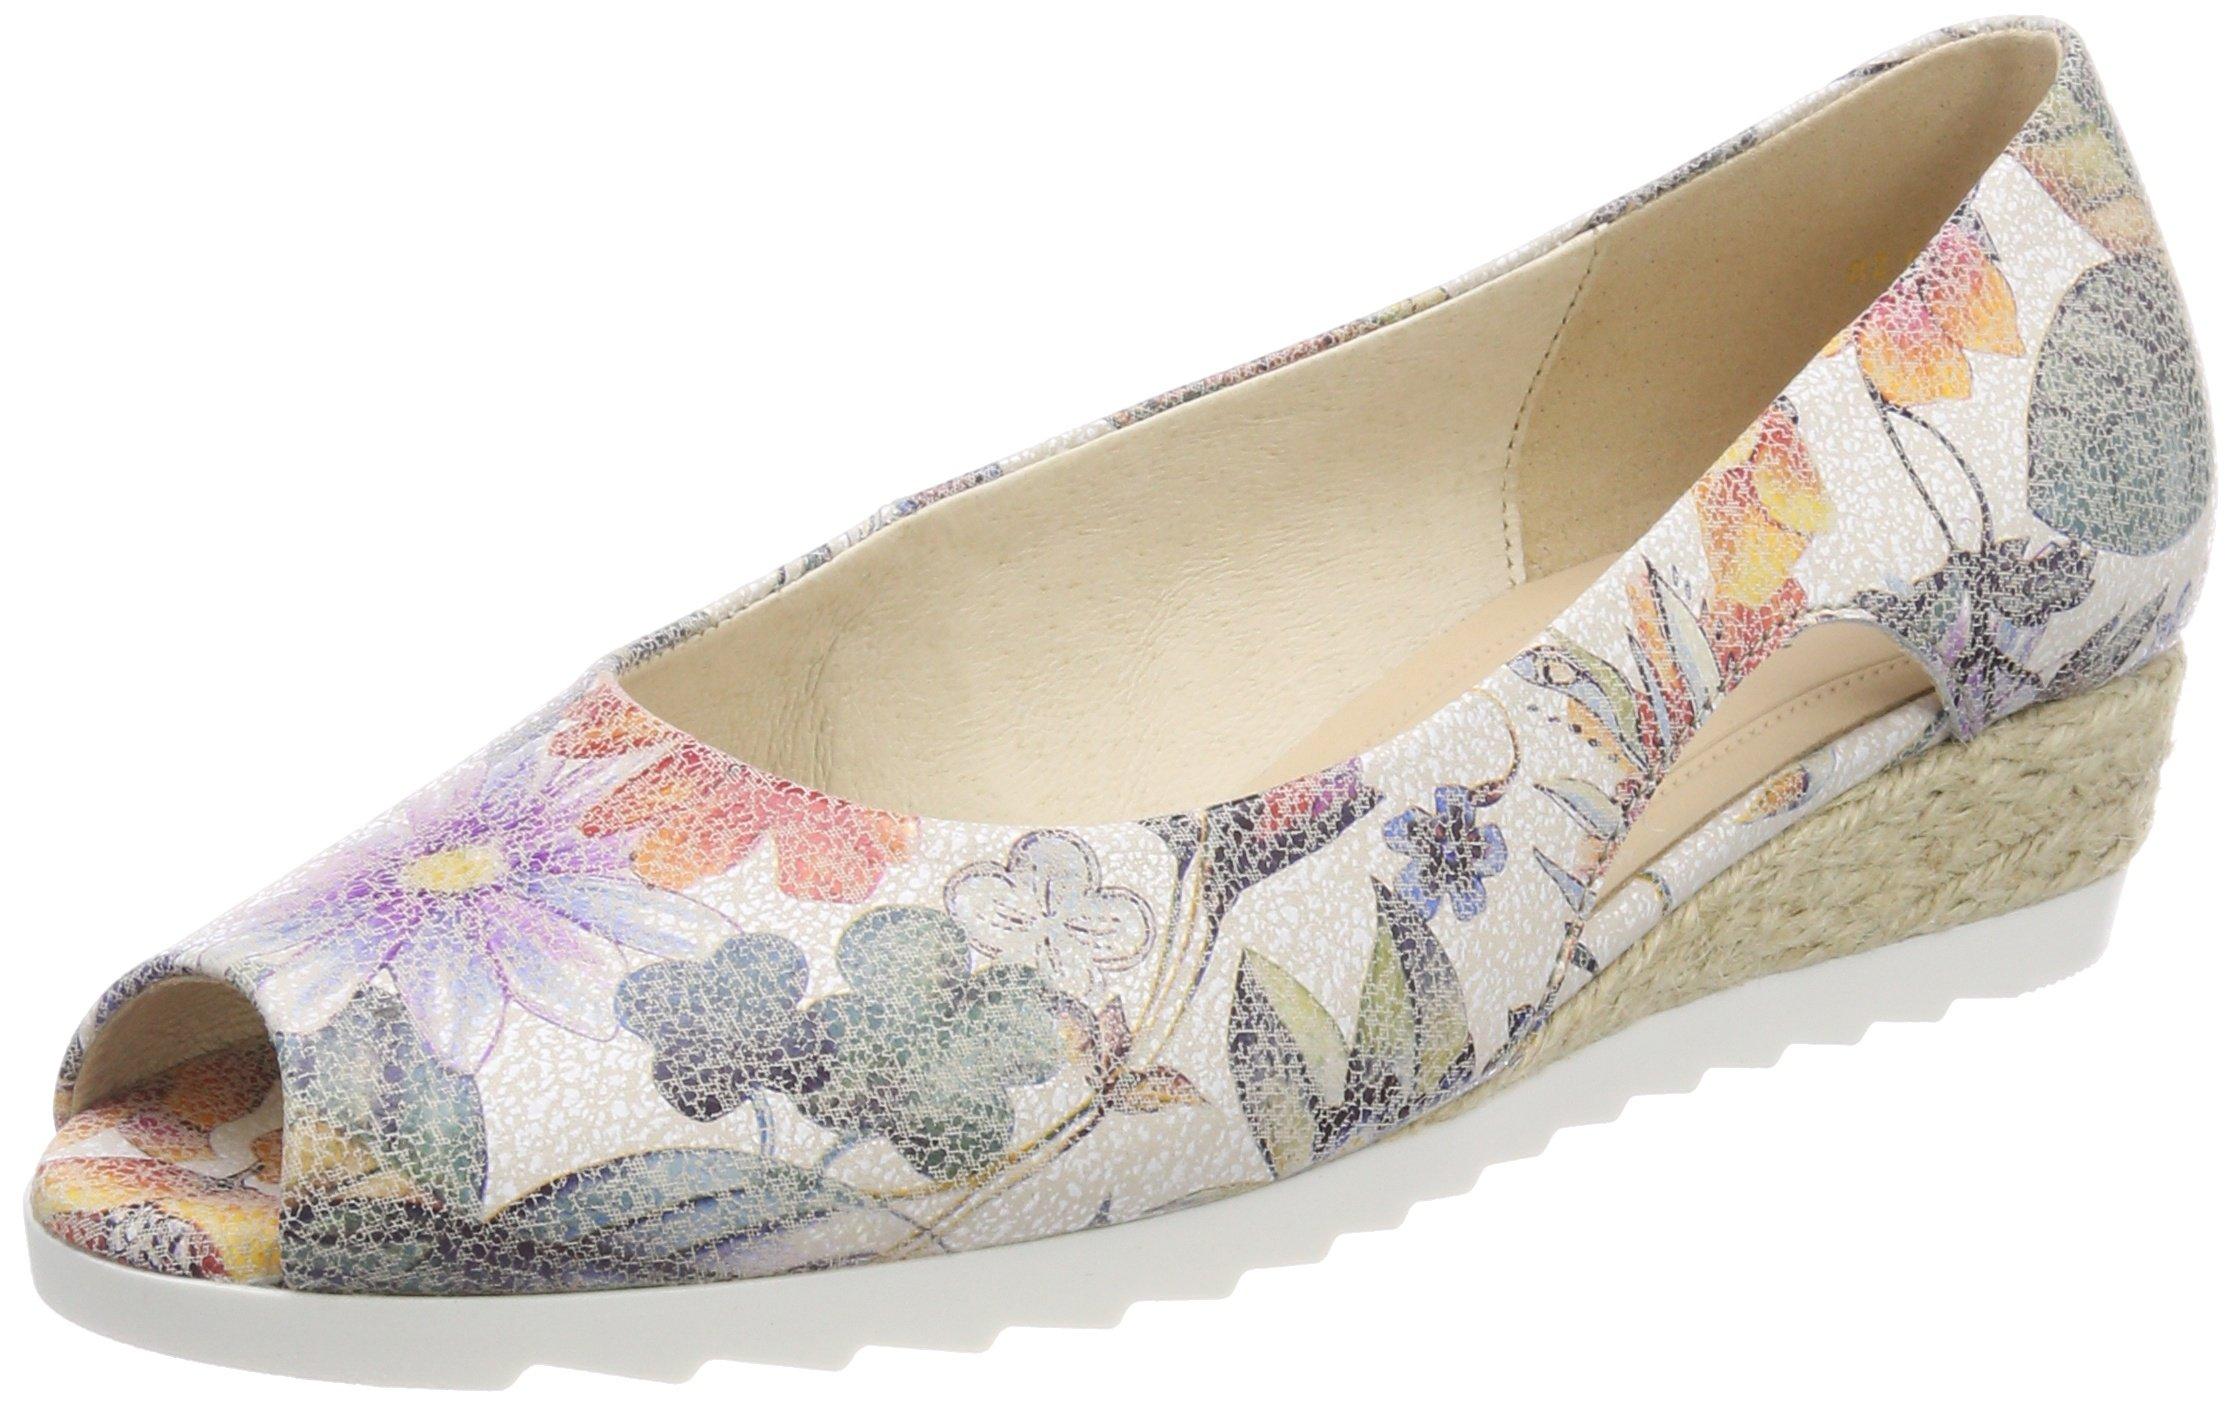 Comfort Gabor FemmeMulticoloremulticolor Shoes SportEscarpins Jute39 Eu IY6gyf7vb